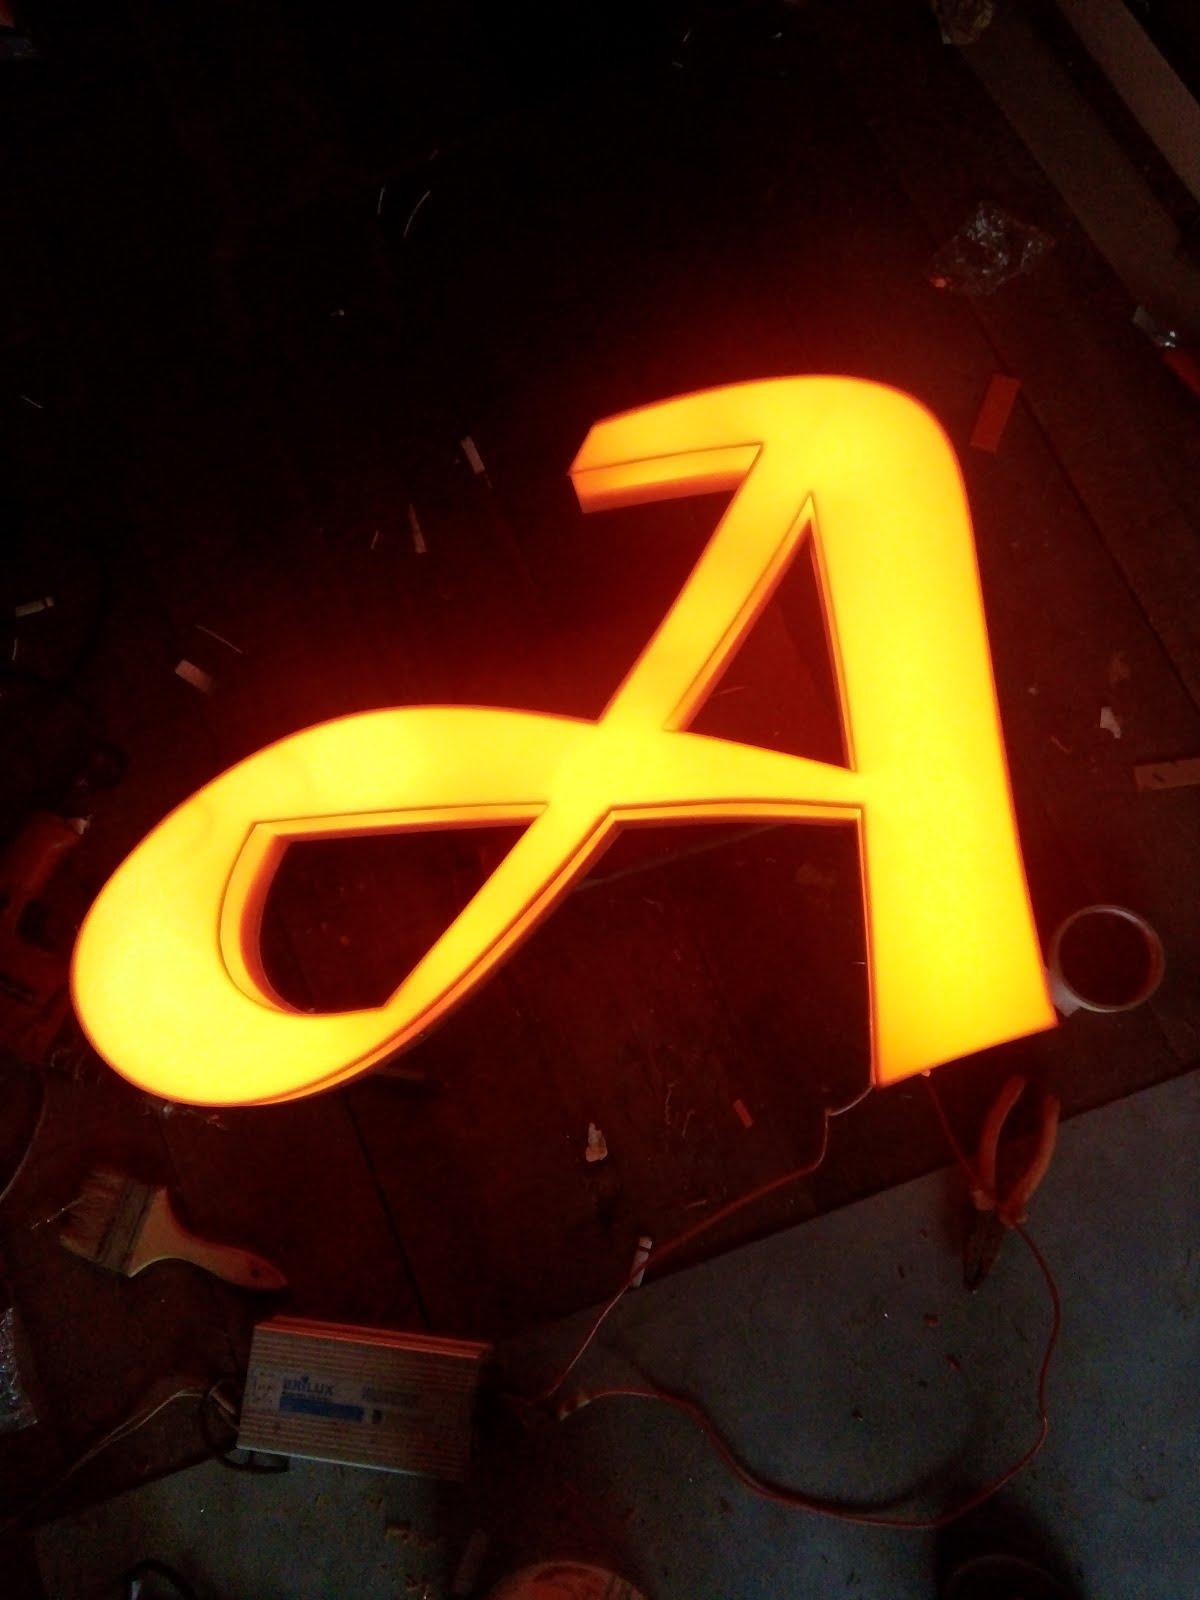 Acrylic 3d Led Letter